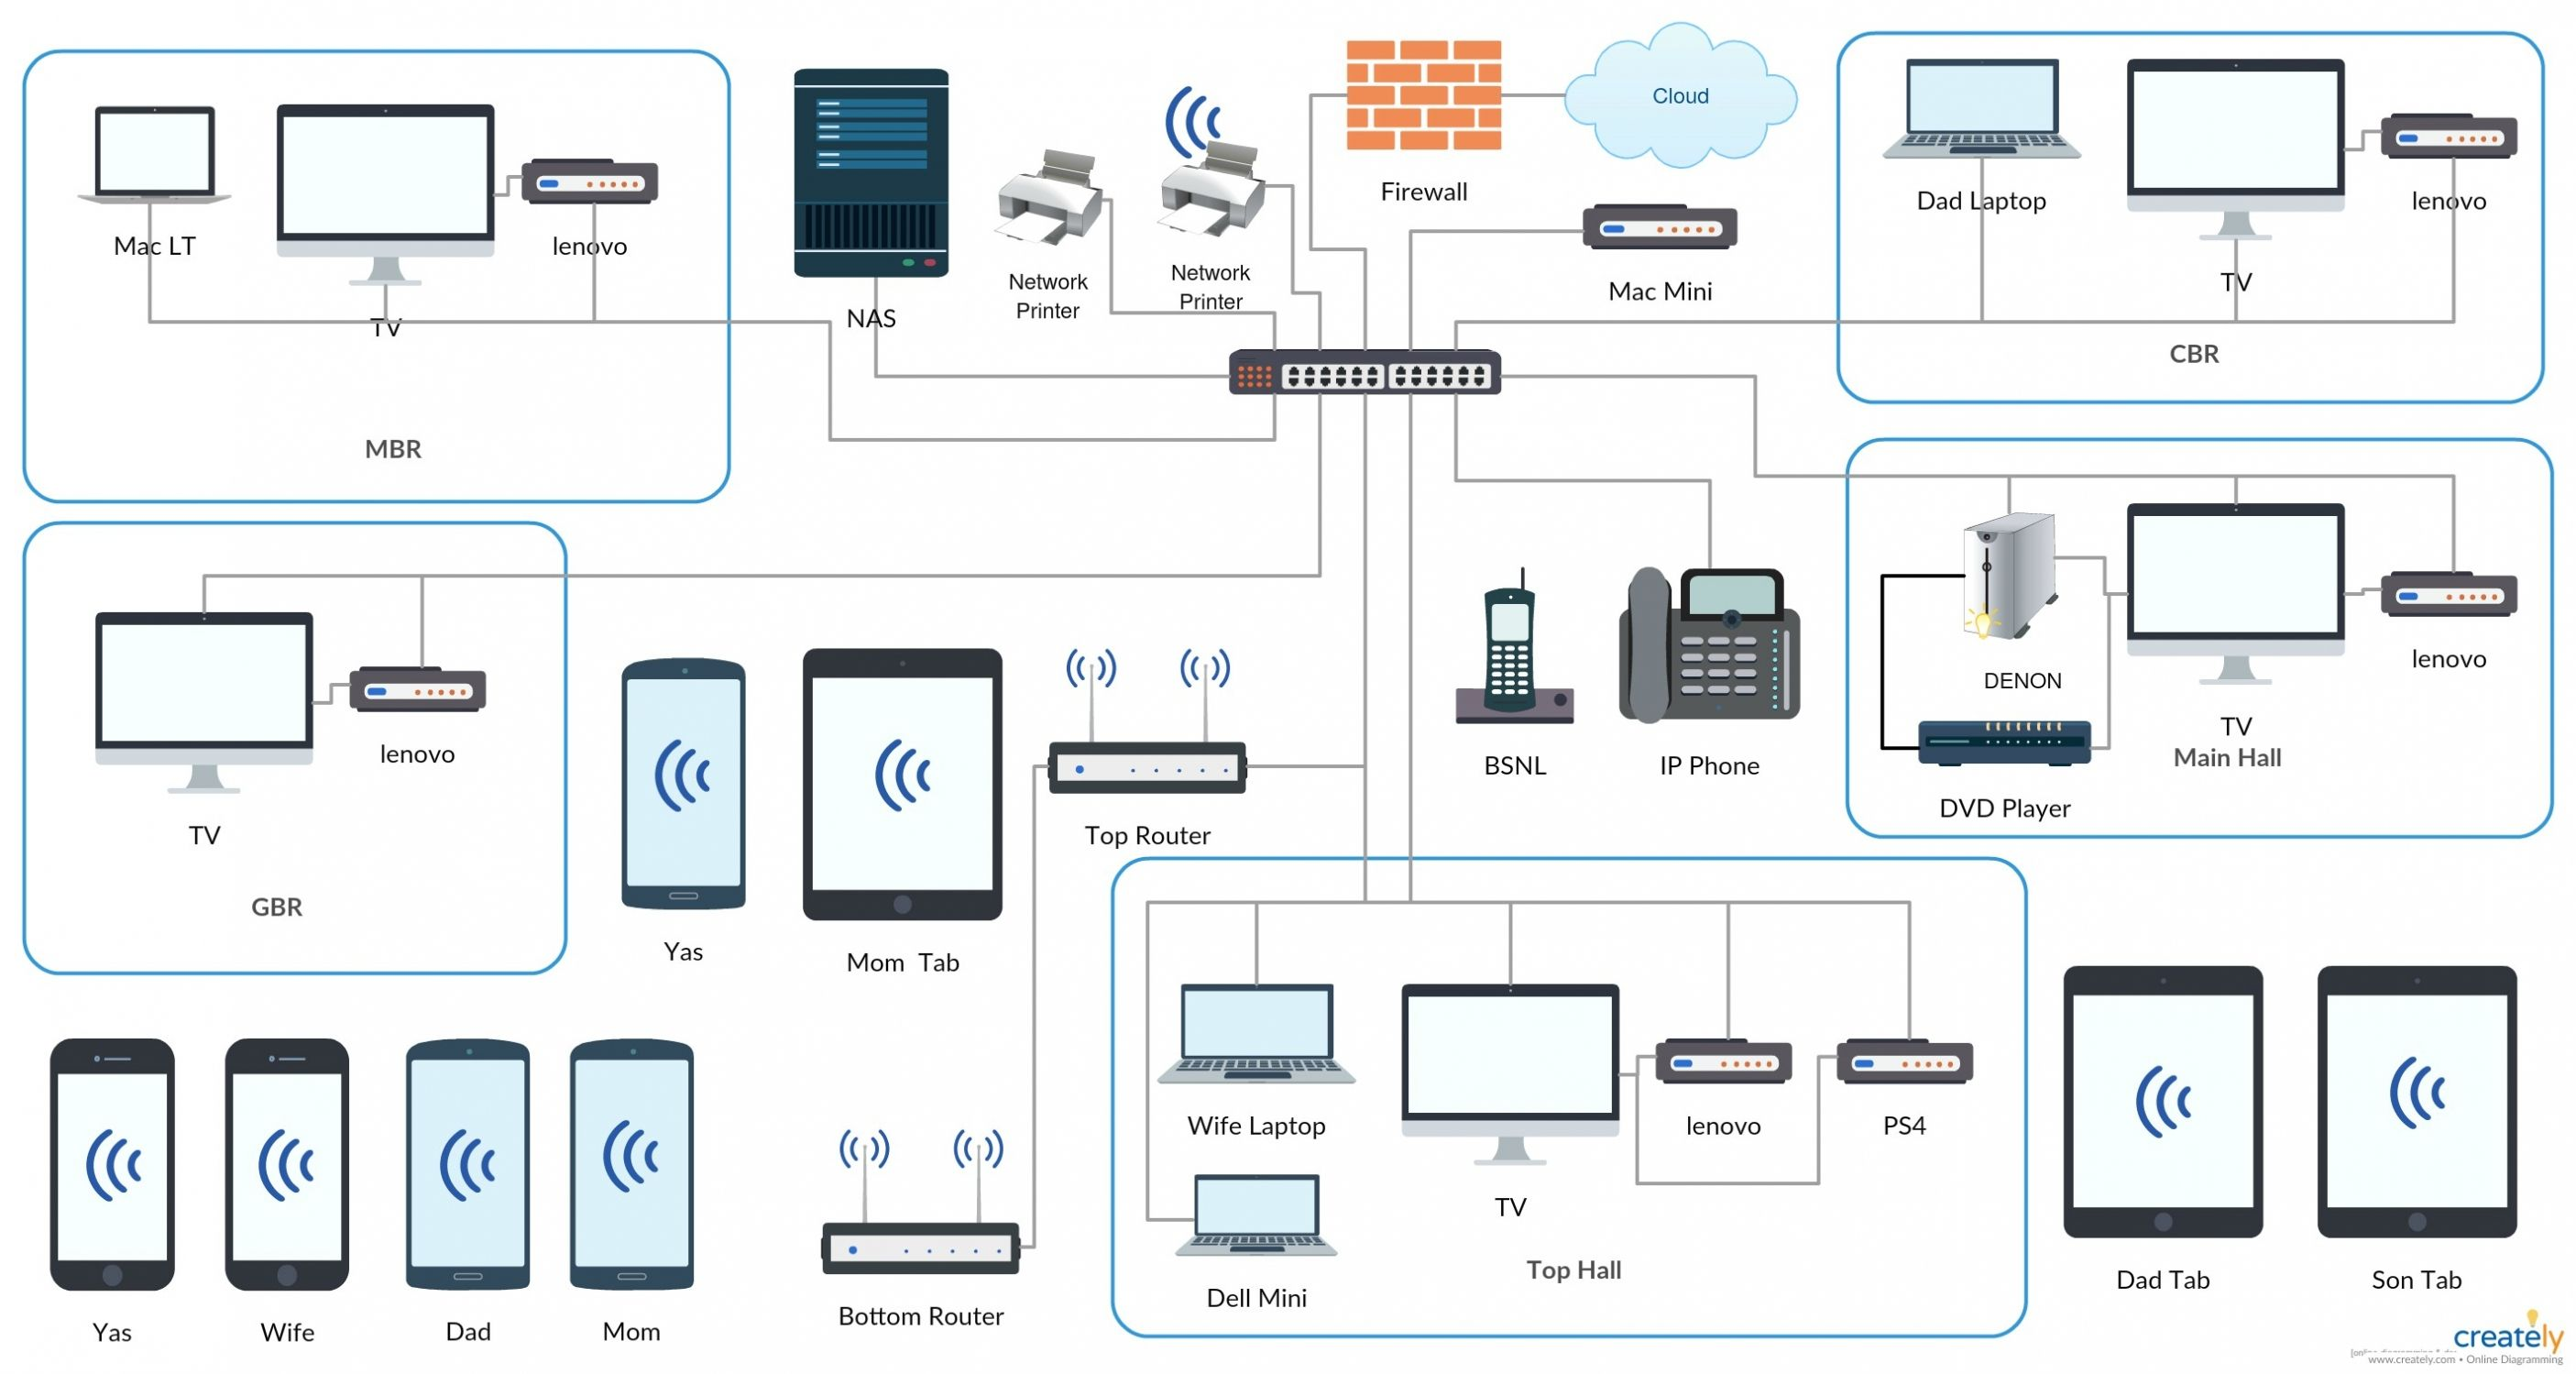 Electrical Wiring Digital Tv Wiring Diagram 94 Diagrams Electrical Car Antenna Digital Tv Wiring Diagram 94 Wiring Diagrams Tv Antenna Antenna Tv